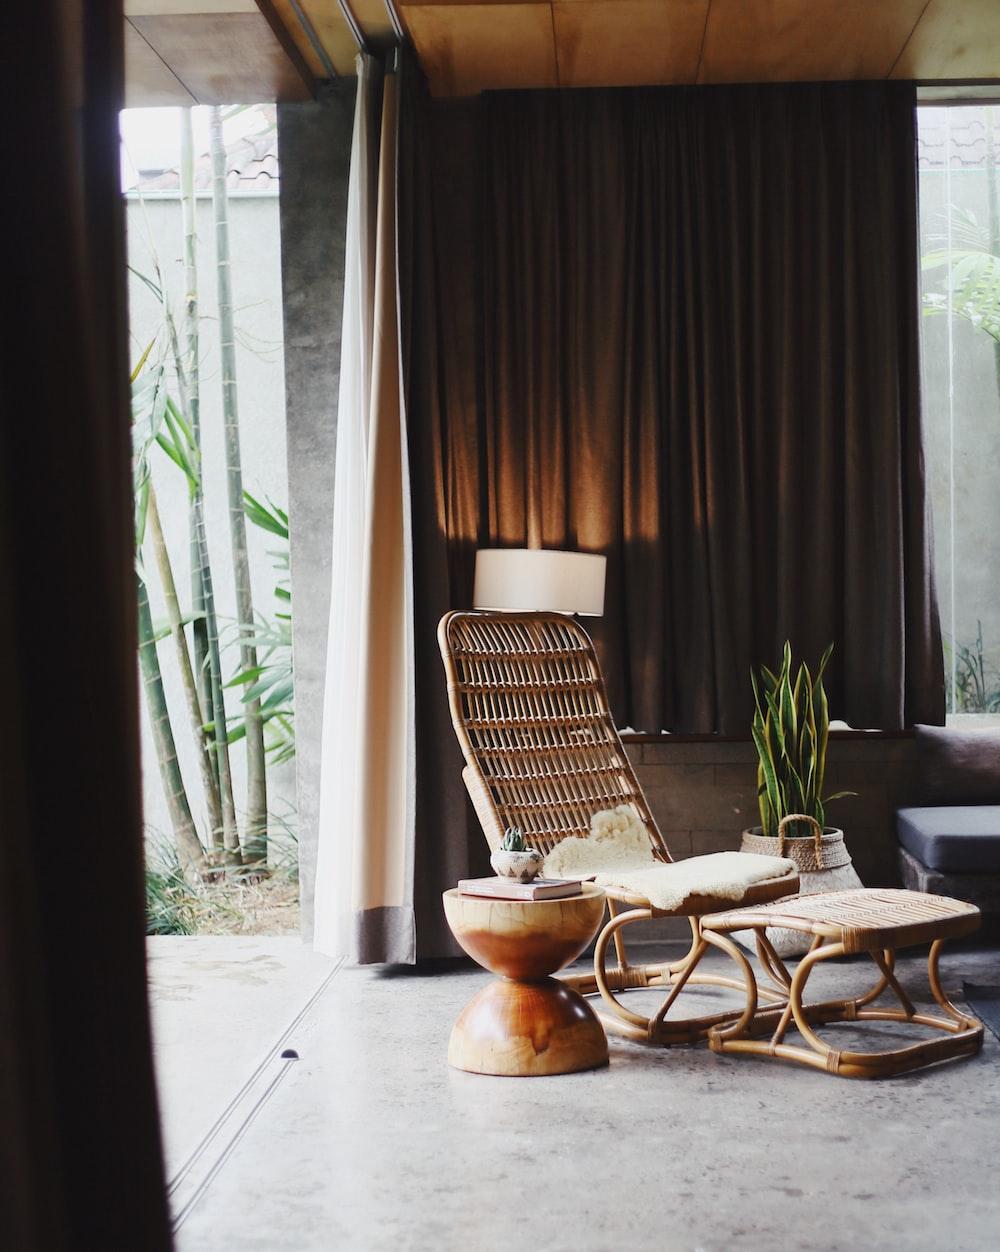 brown rattan chair with ottoman inside room near curtain